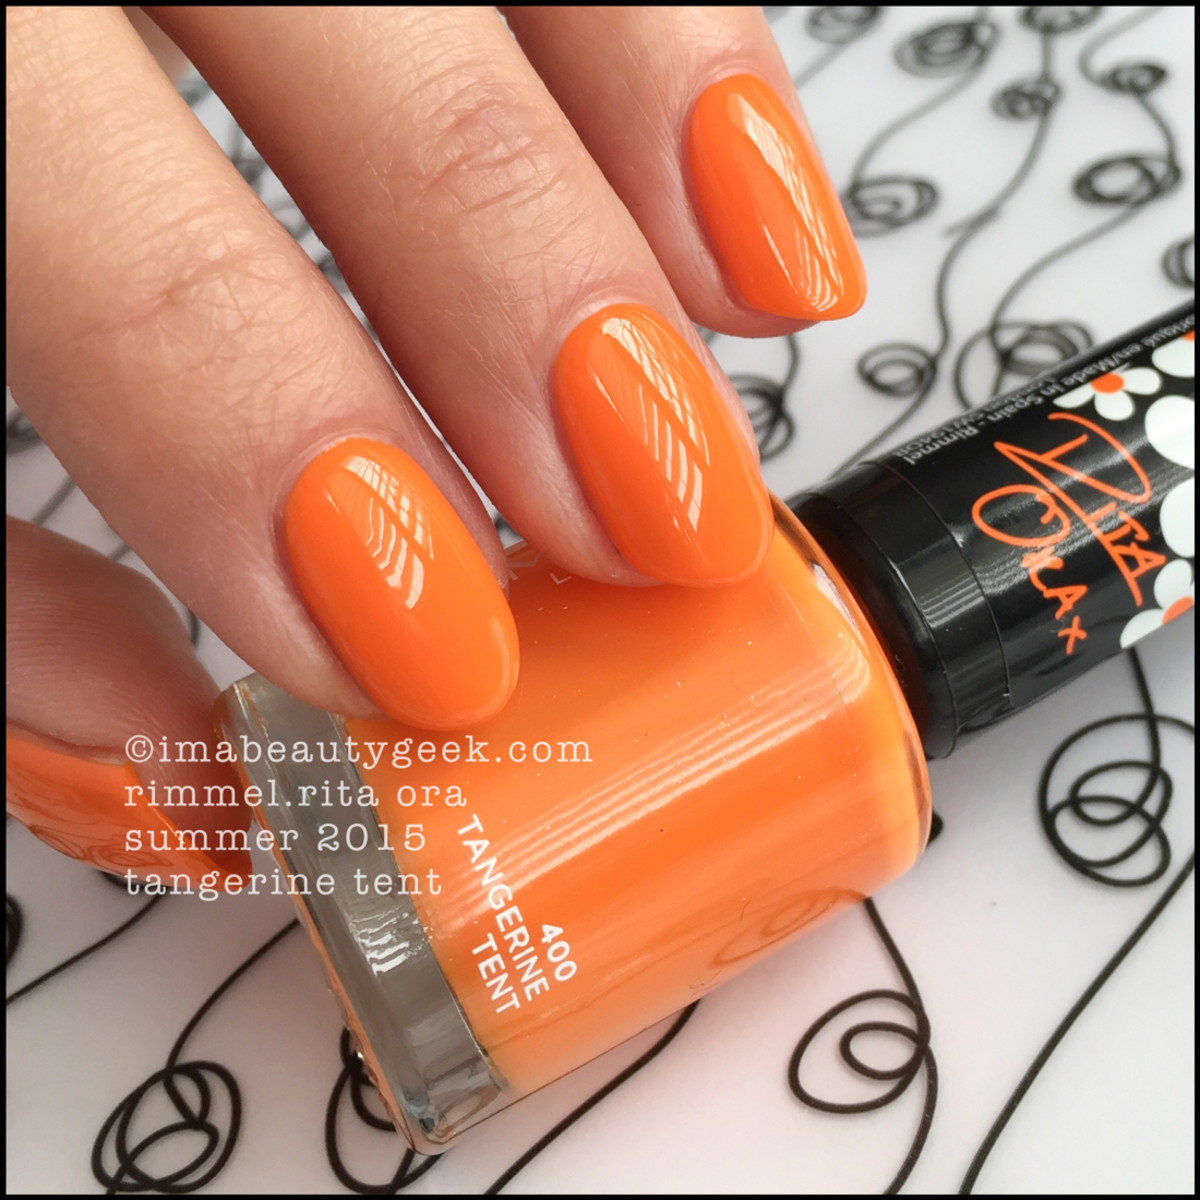 Rimmel Rita Ora Tangerine Tent Summer 2015 Nail Polish